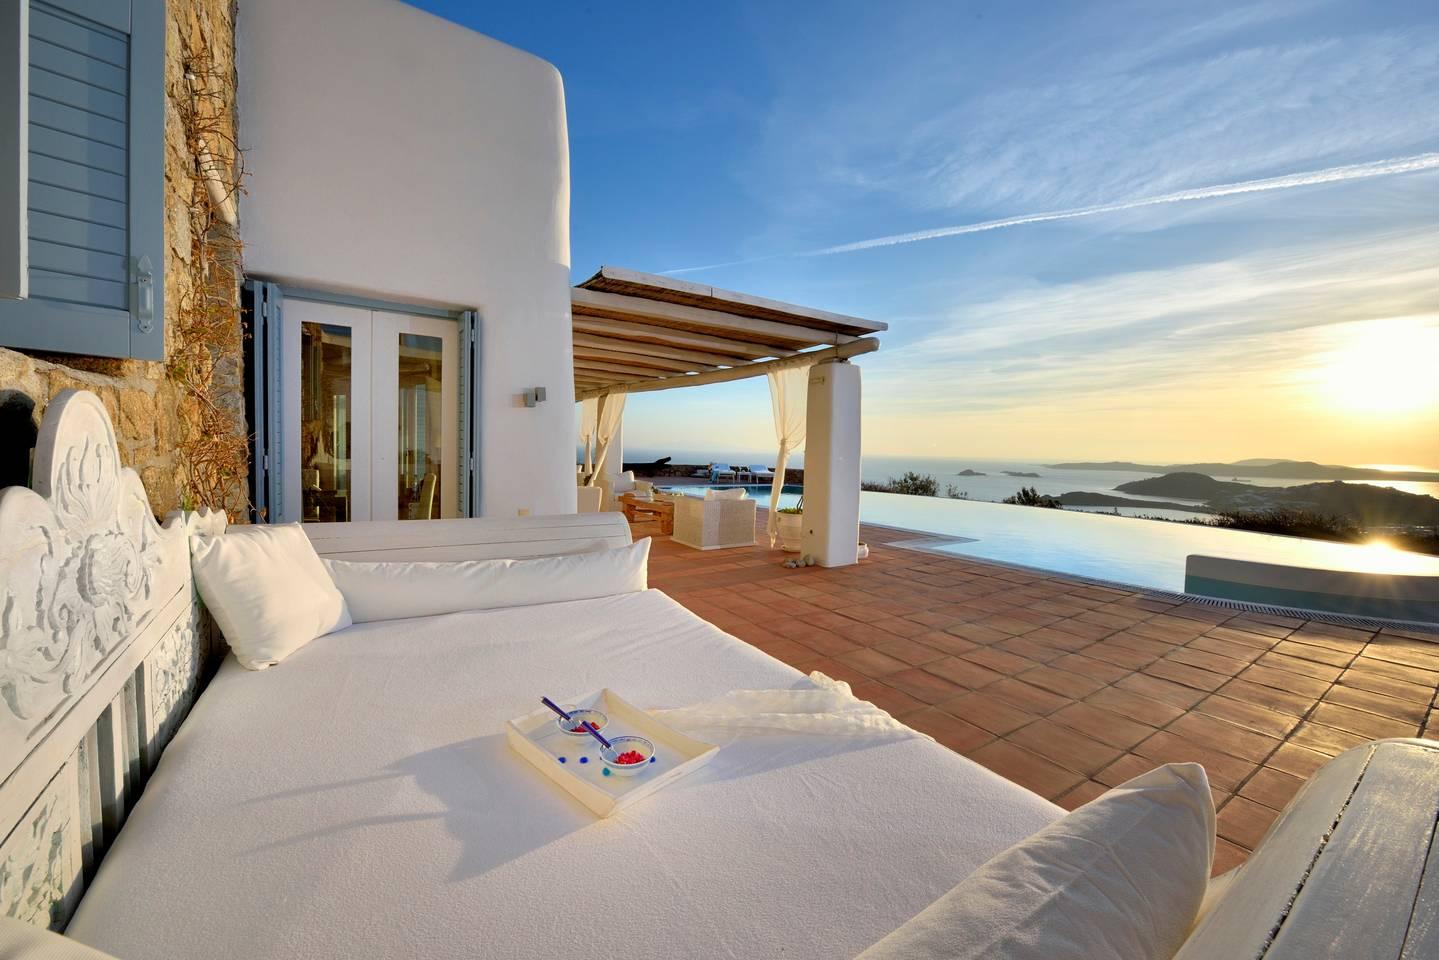 Apartment Amazing panoramic views villa close to town photo 23186663